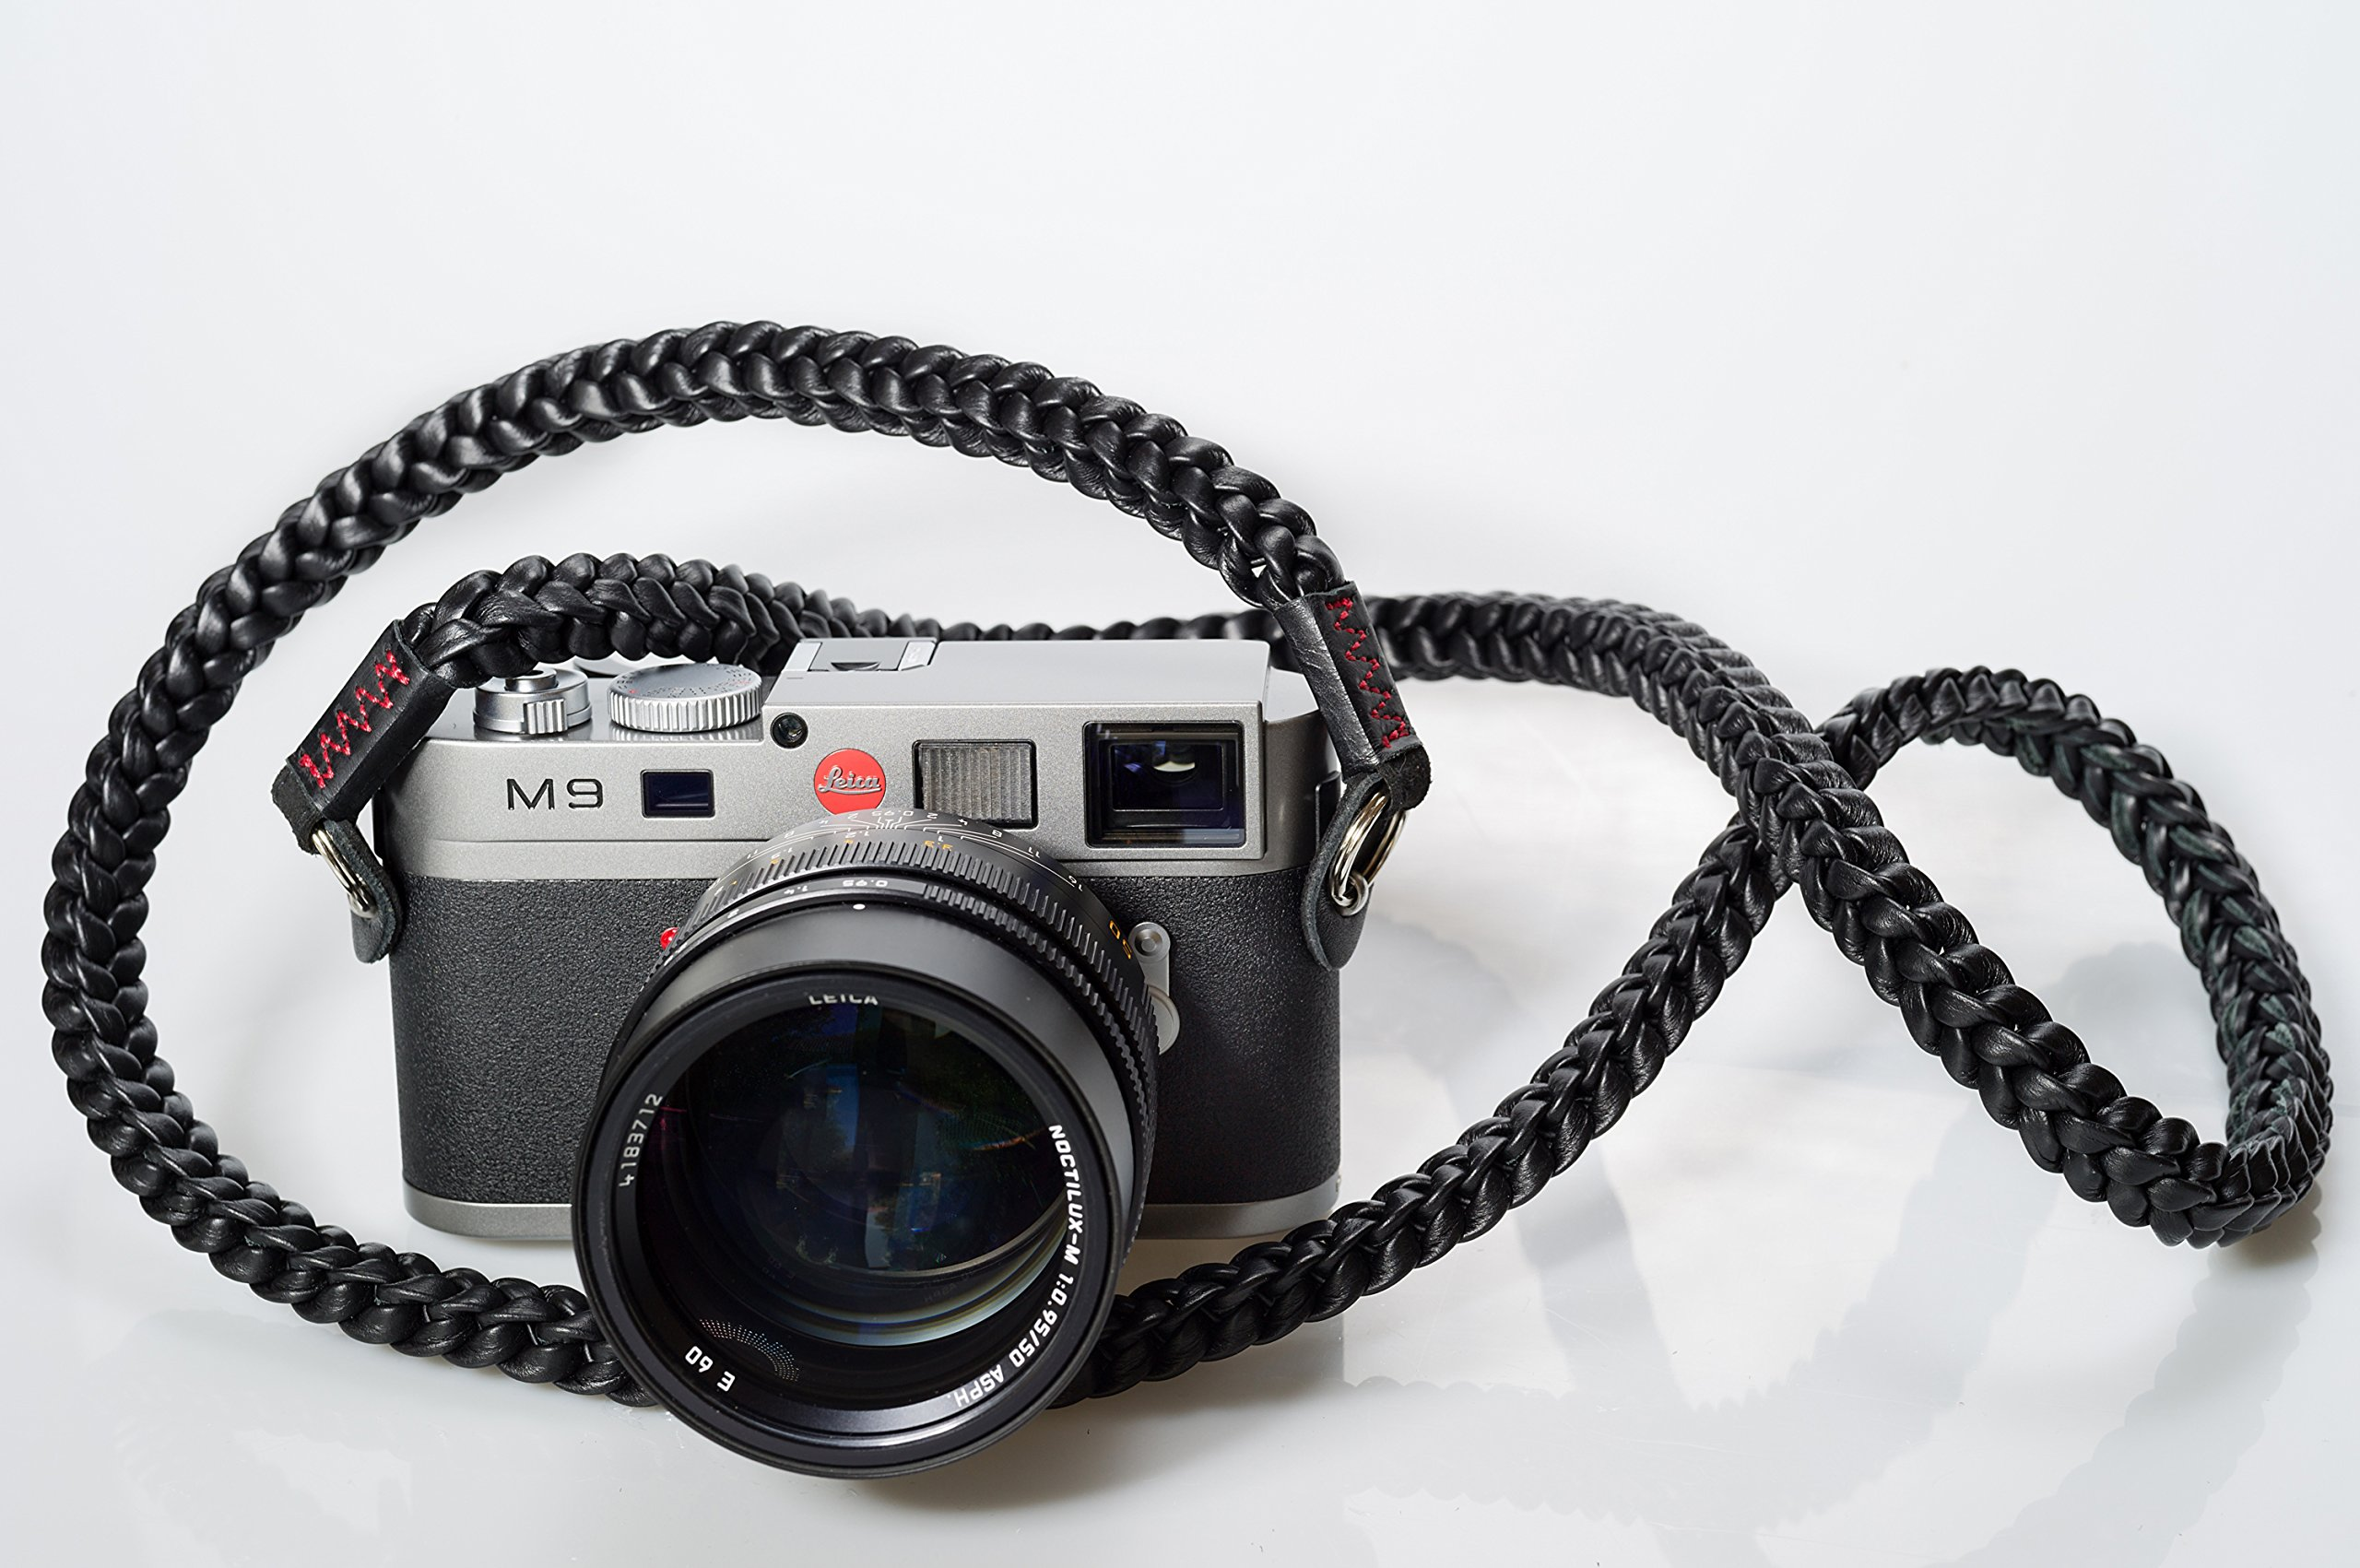 Barton 1972 Pitch Black Braided Leather 1972 XL 50'' (125cm) Leica Sony Fuji Luxury Designer Barton1972 Top Grain Leather by Barton 1972 (Image #2)